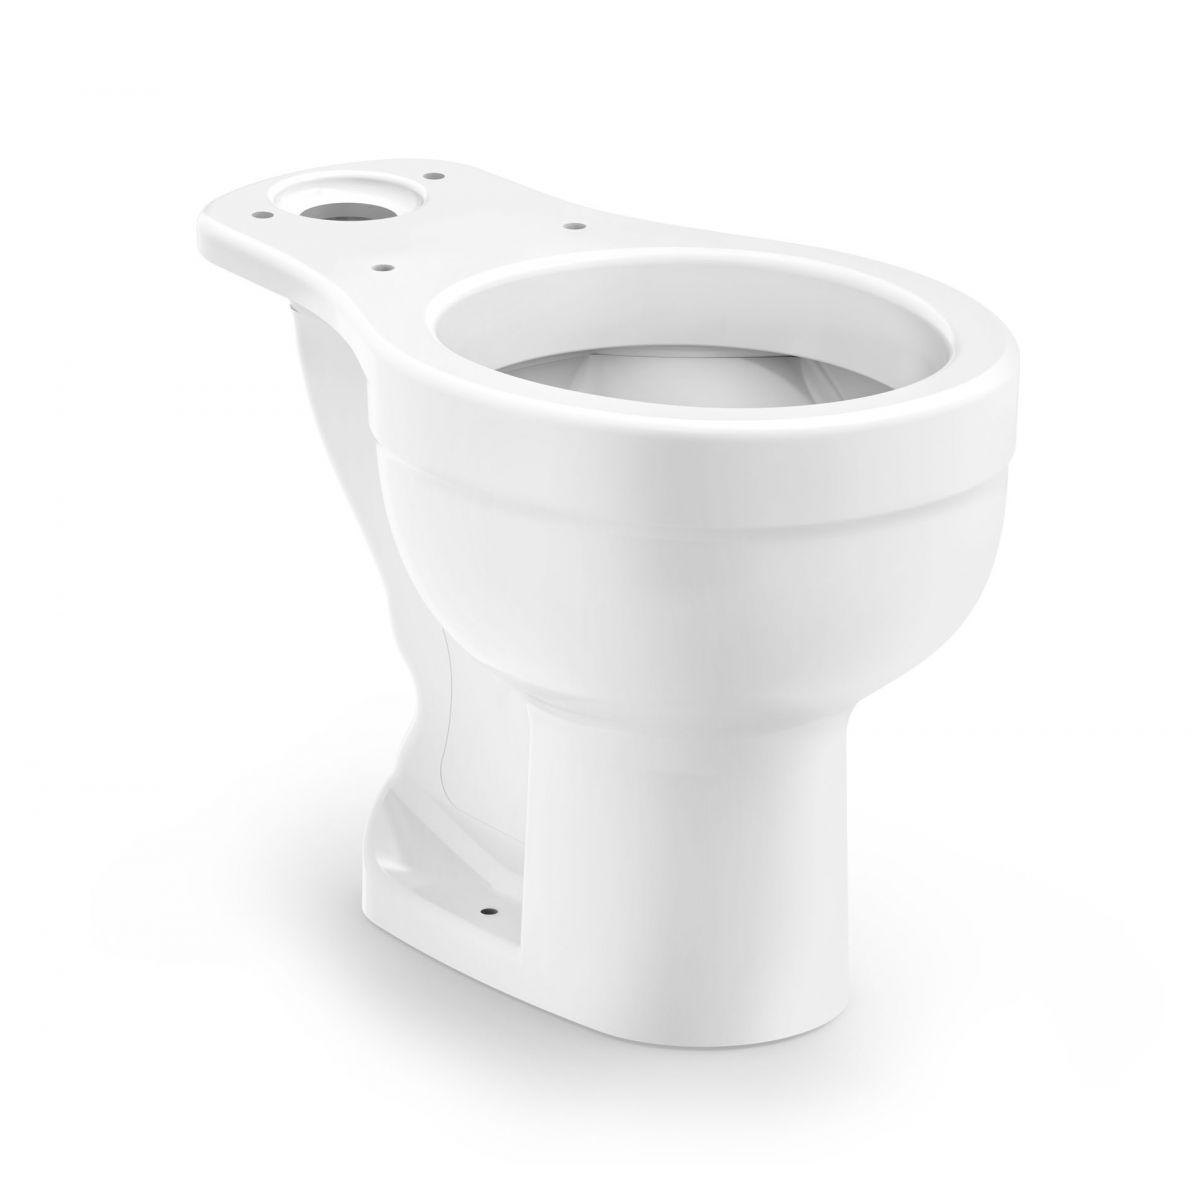 Bacia P/ Caixa Acoplada S/Abertura Frontal Branco Celite 1313600010300